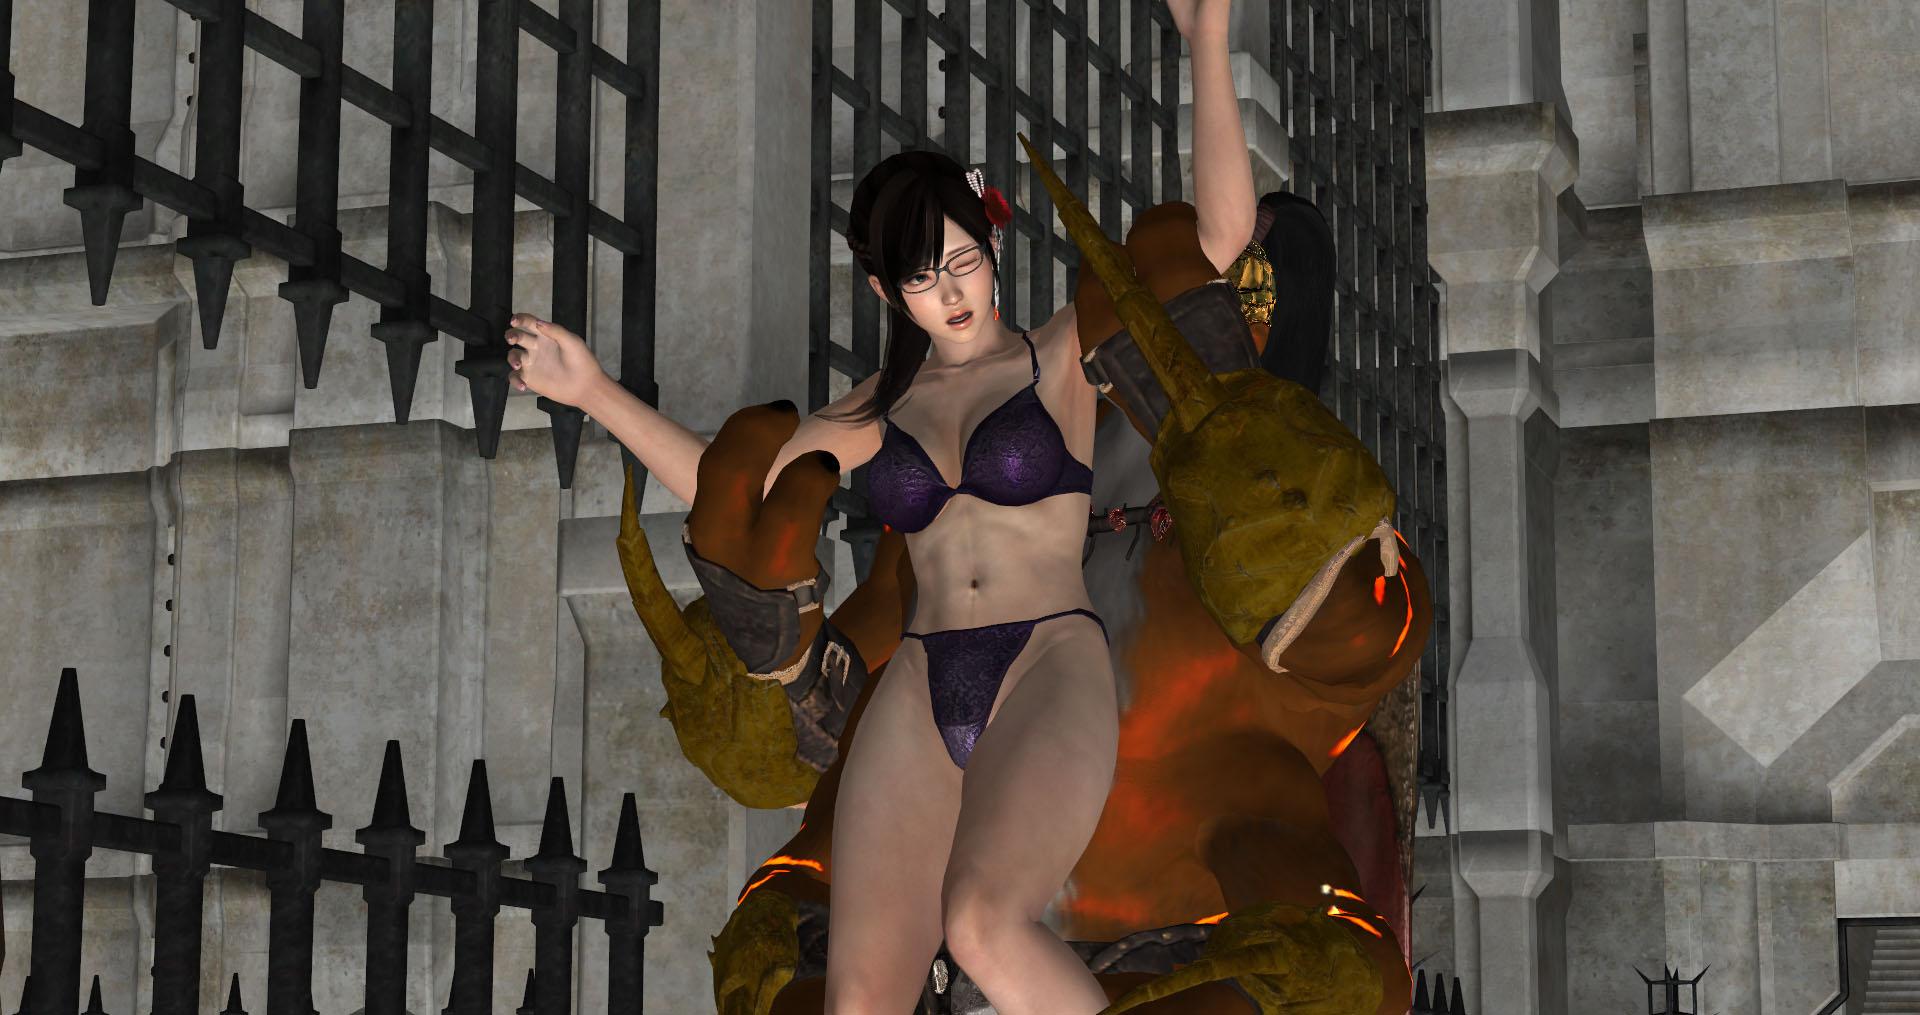 kokoro_raped_by_kintaro_0099_layer_41_by_bitemonsters-dbli5ee.jpg